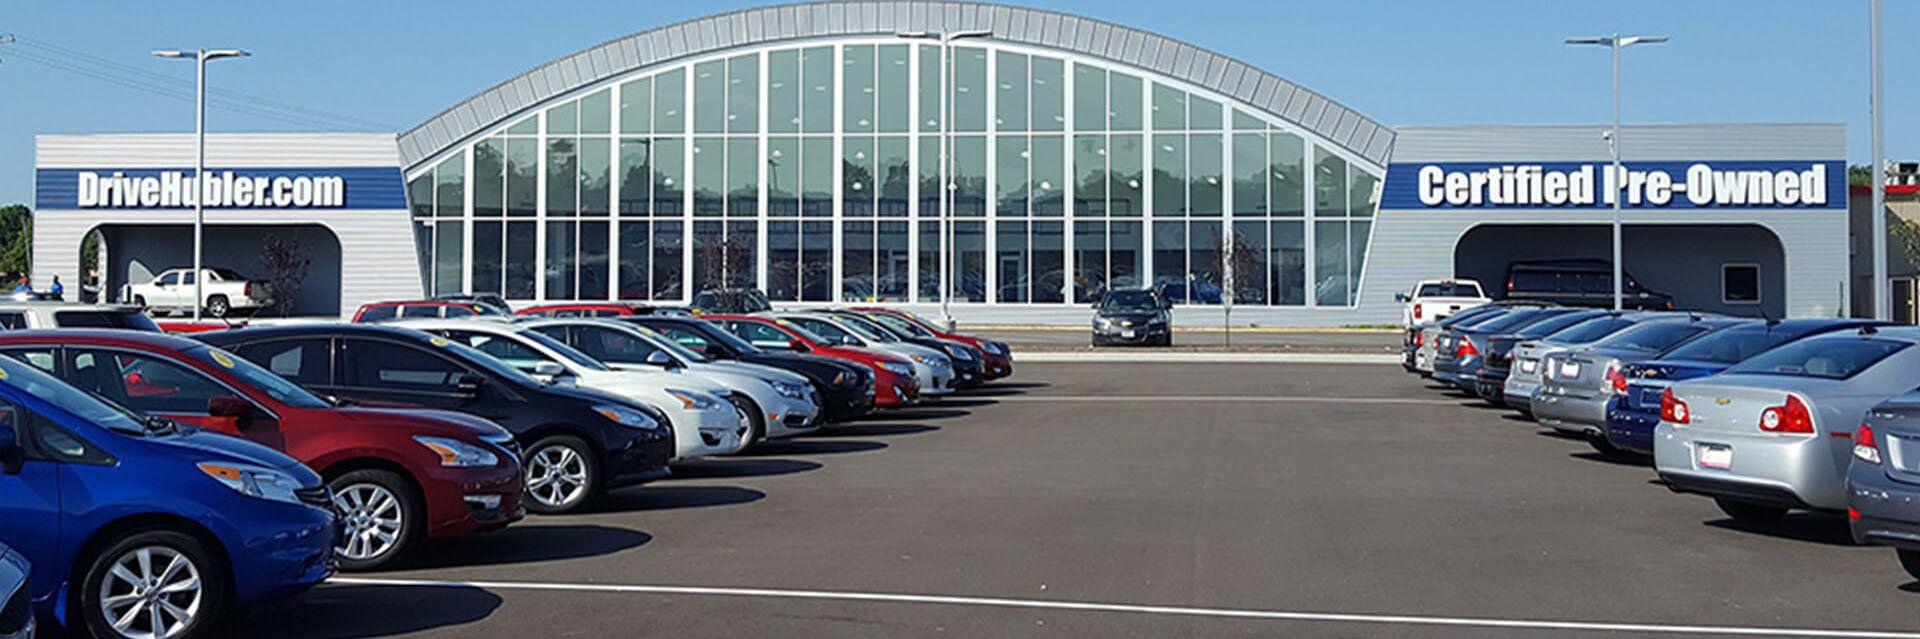 Car Dealerships In Greenwood Indiana >> Car Dealerships In Greenwood Indiana_2101 | Greenwood indiana, Used car reviews, Car